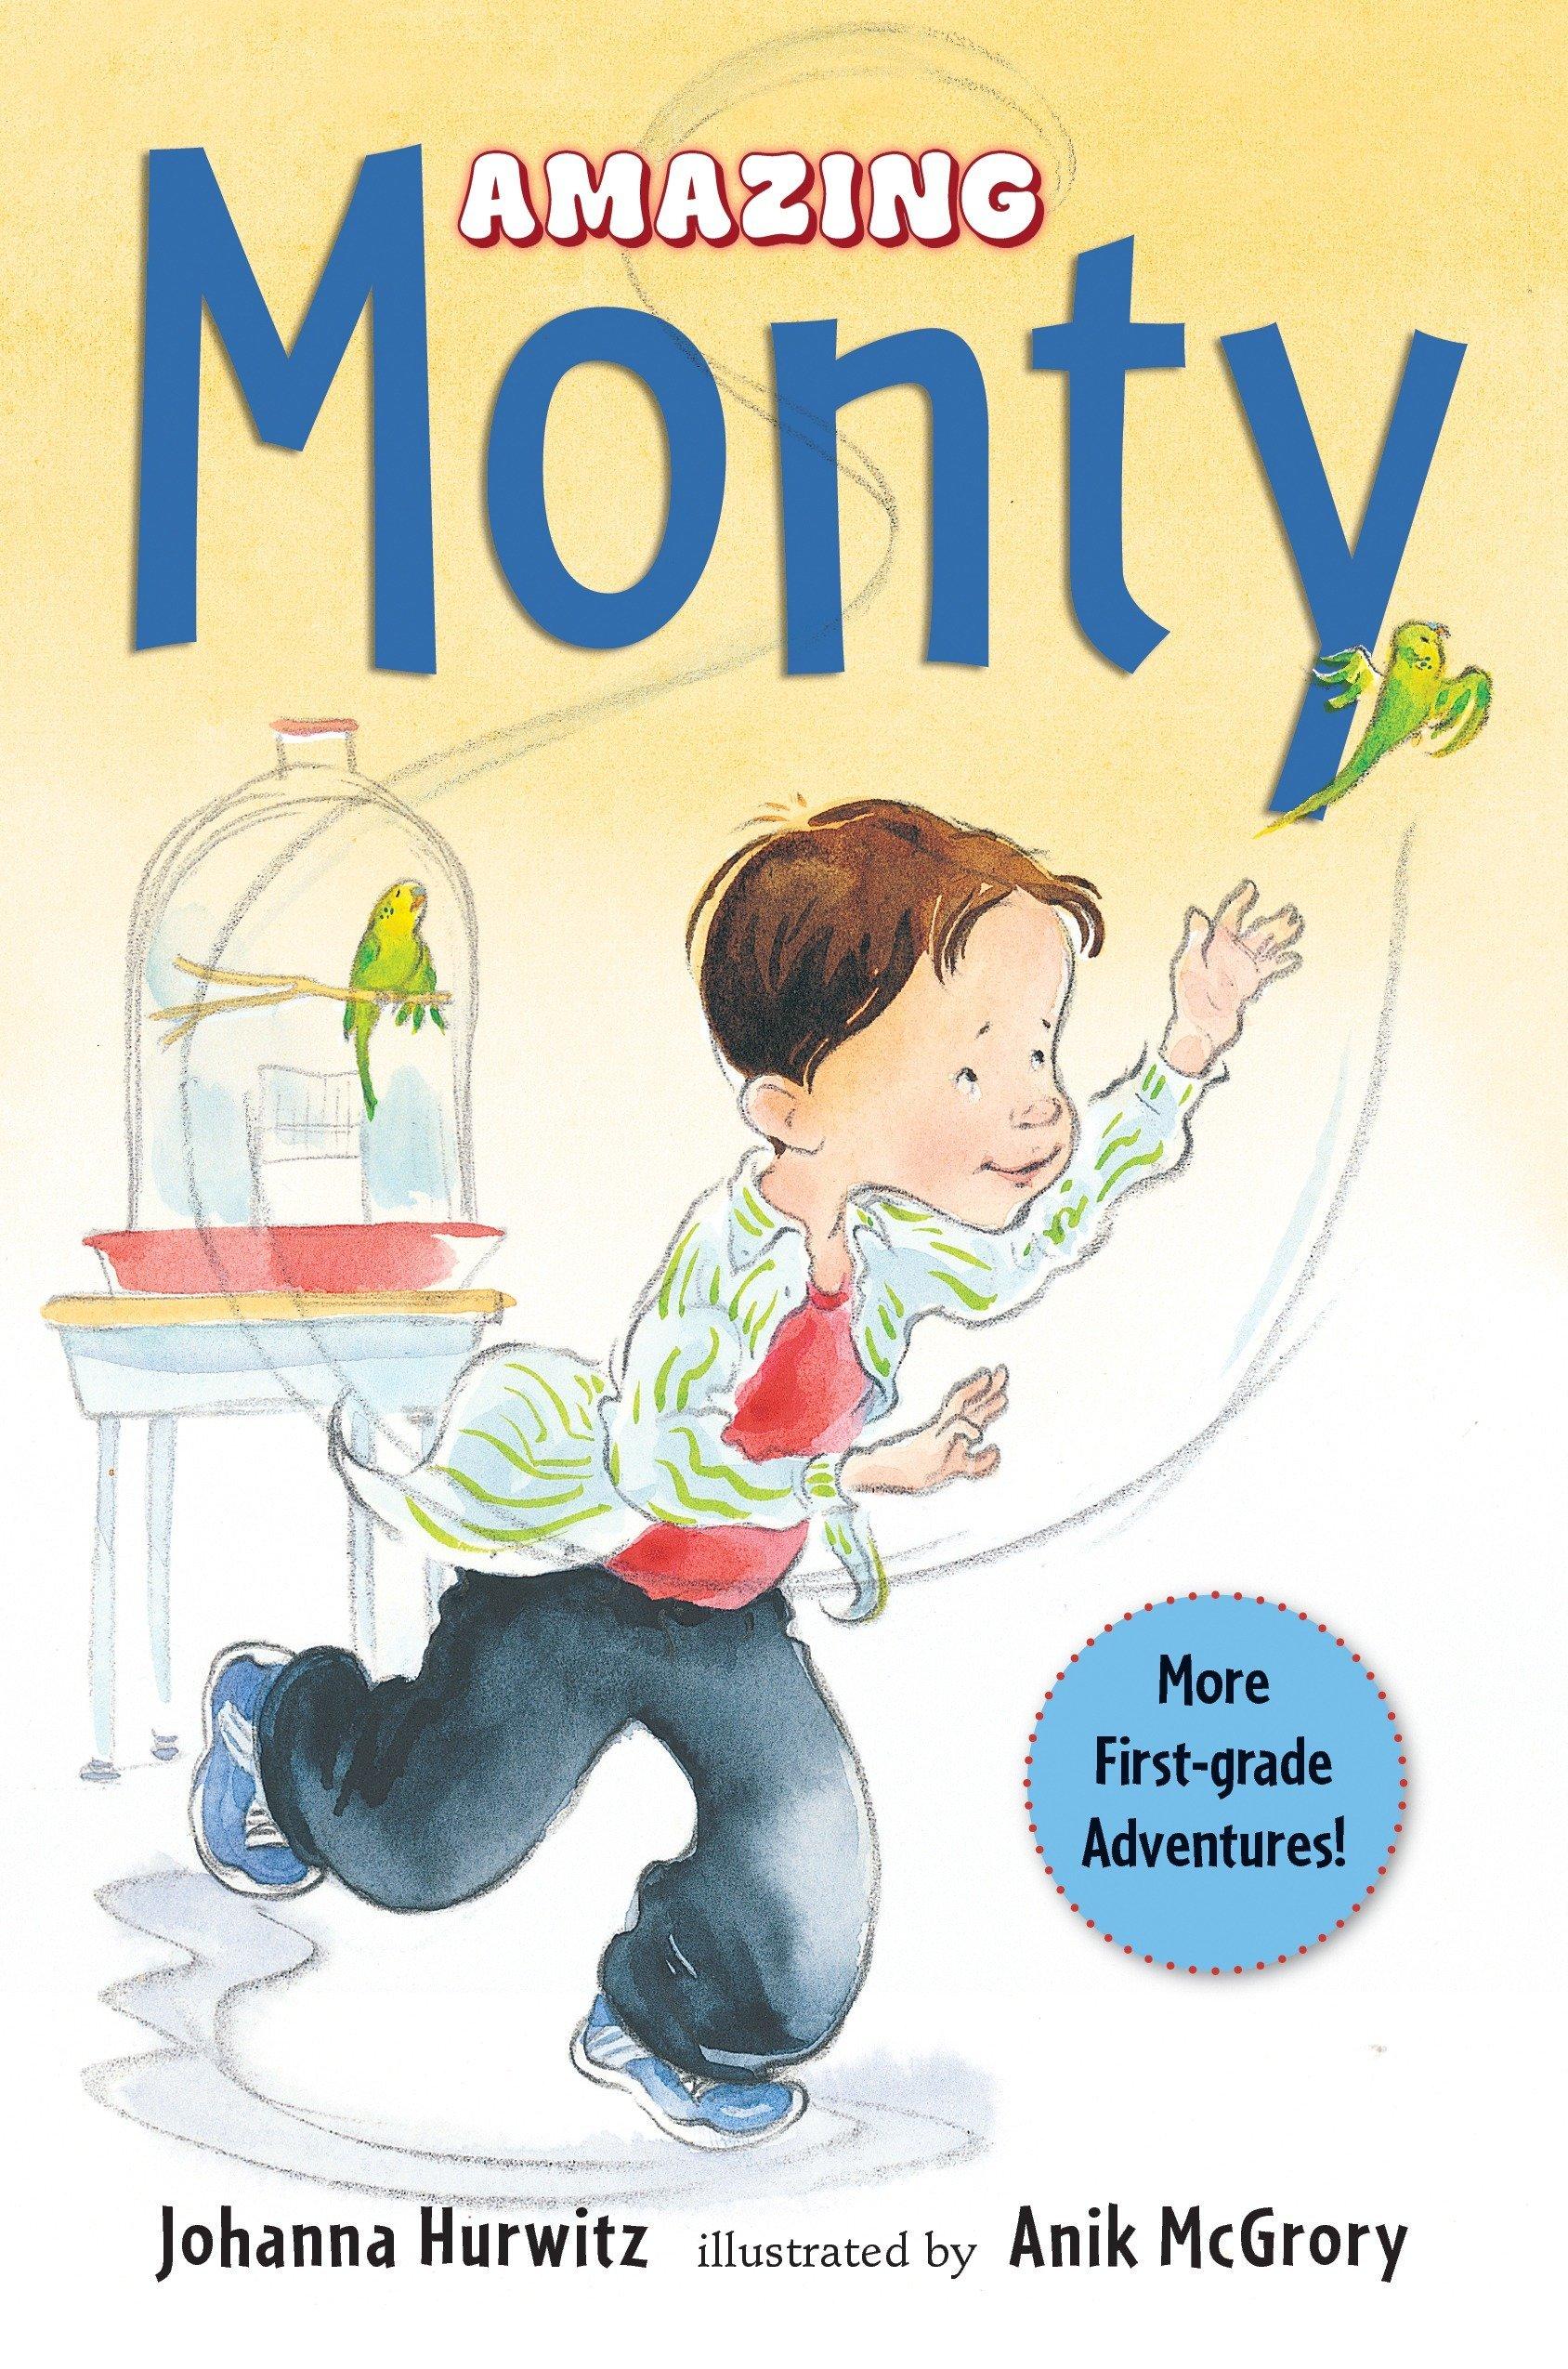 Amazon.com: Amazing Monty (9780763665616): Johanna Hurwitz, Anik McGrory:  Books